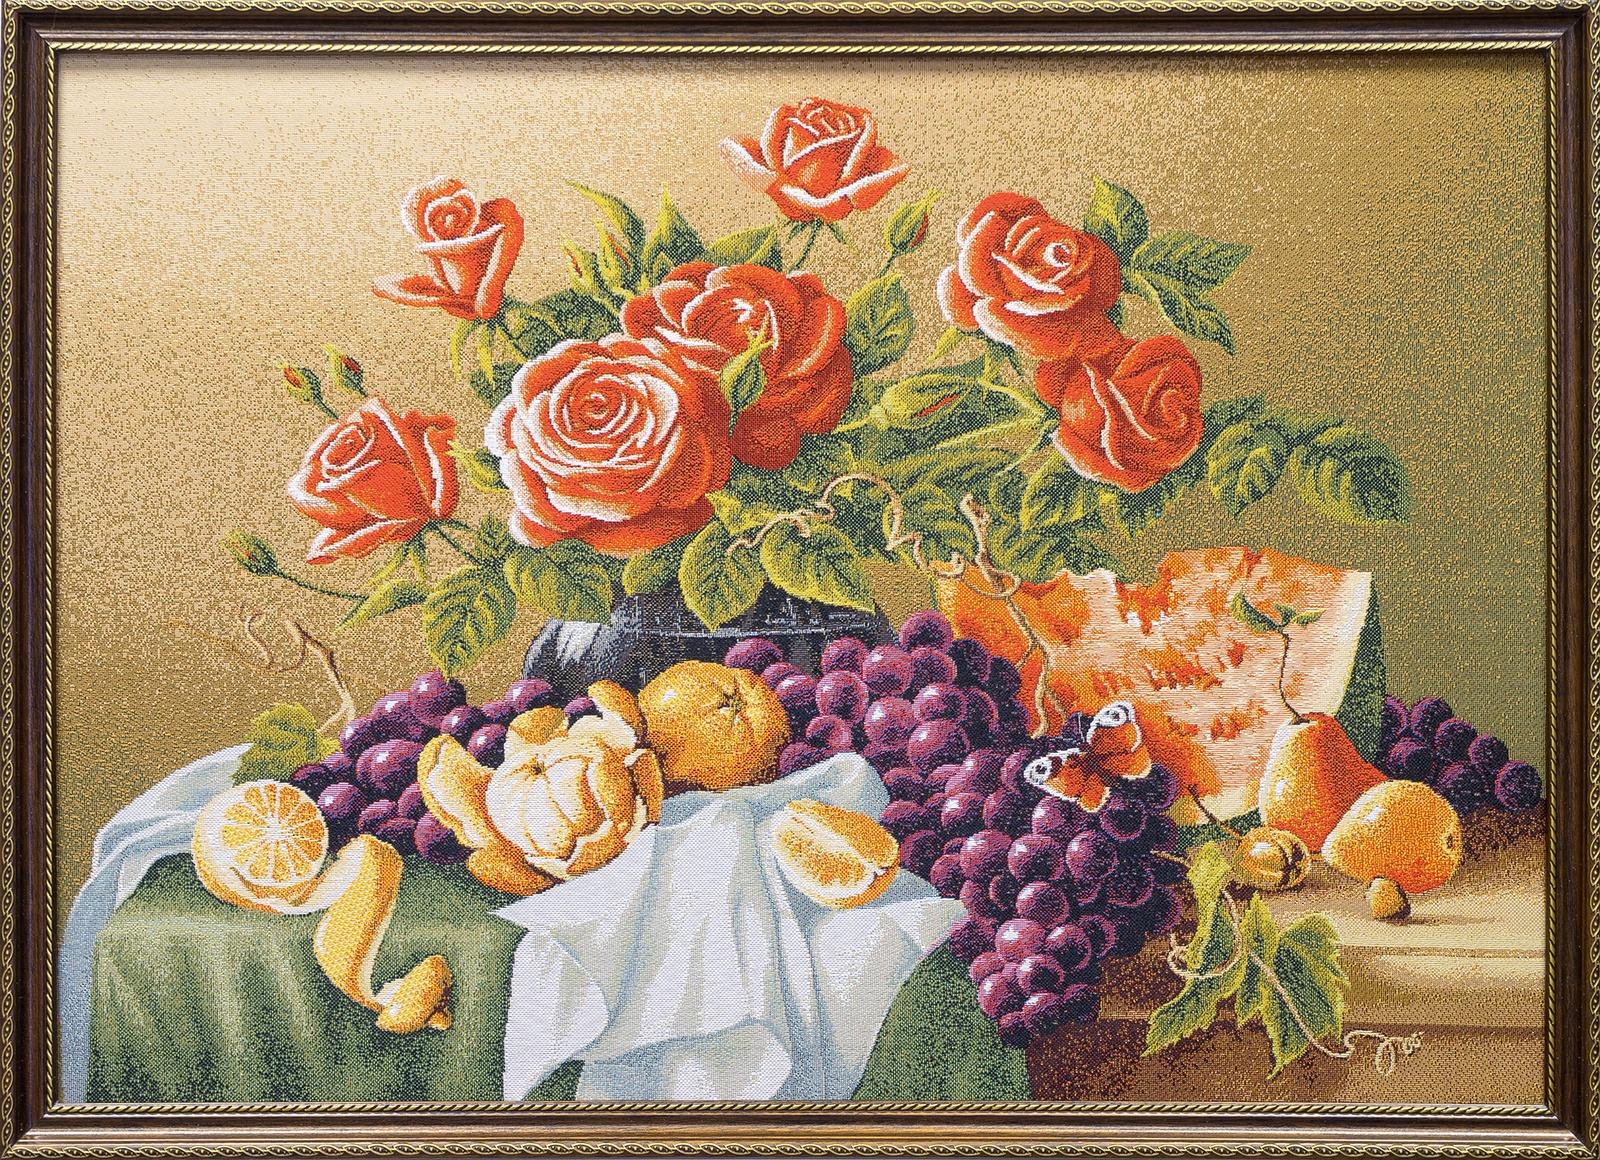 Картина Магазин гобеленов натюрморт с розами 50*72 см, Гобелен